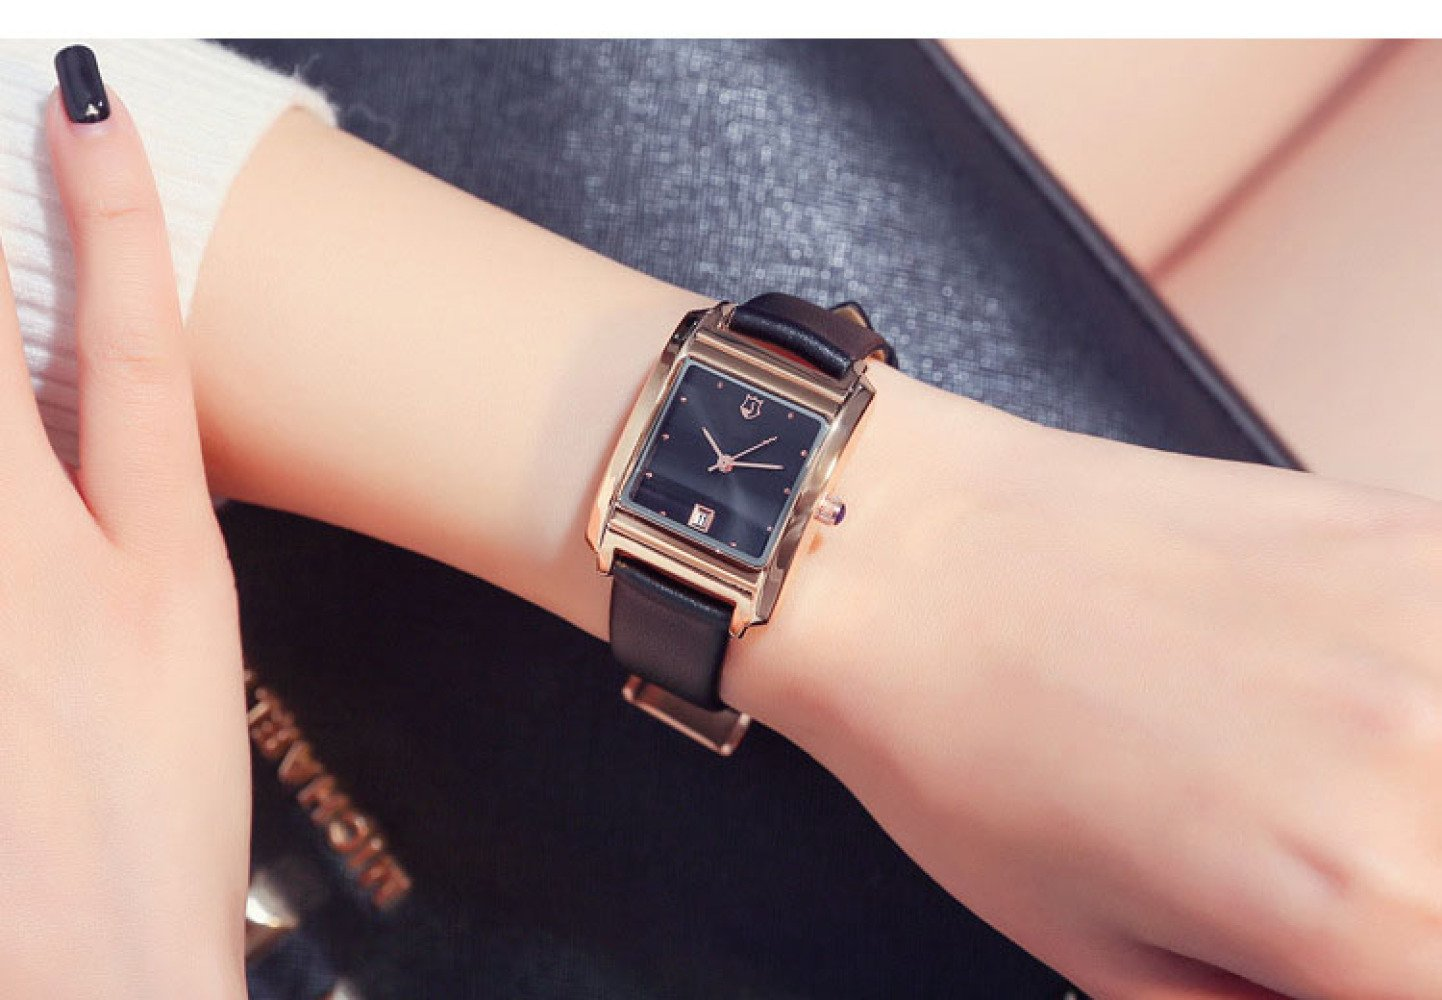 GJJ Leather Rectangular Watch Women's Calendar Simple Temperament Fashion Watch-Fashion Pointer Quartz Watch,Black face blac,A